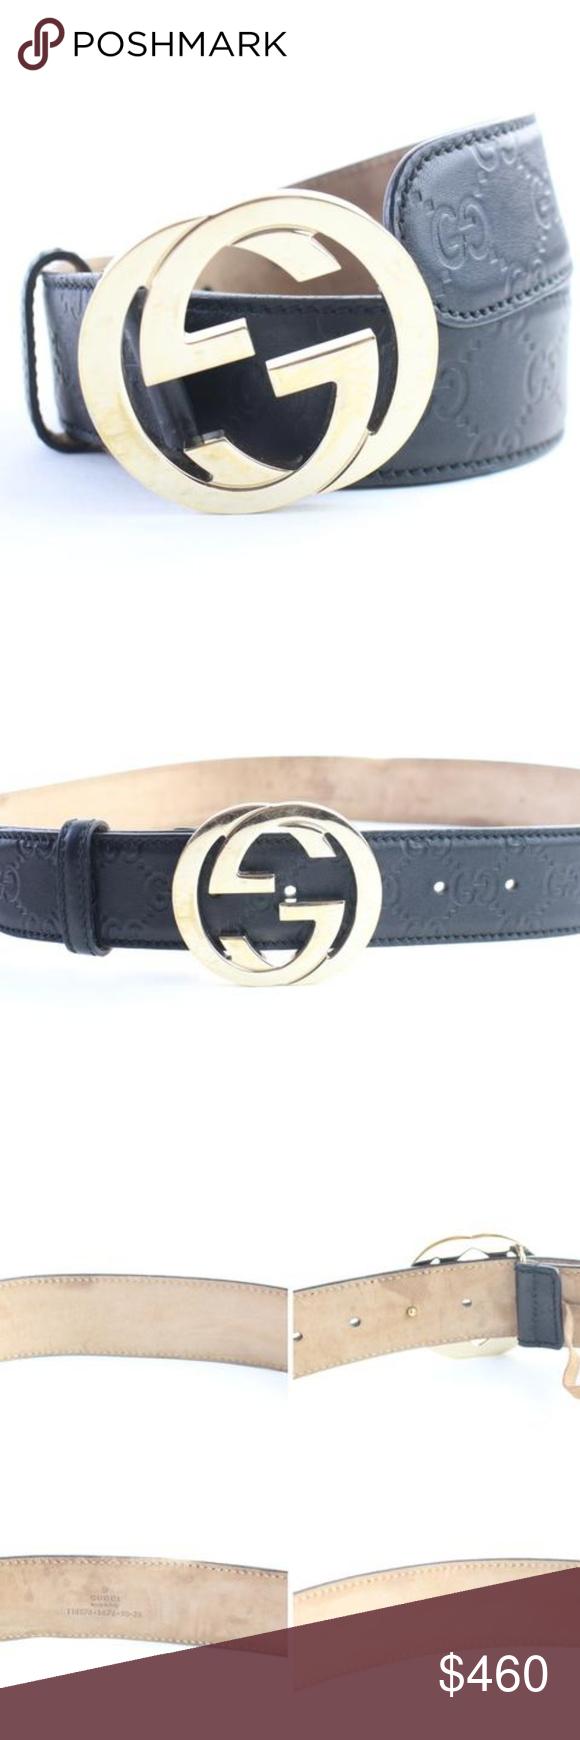 f689a2460cfa Guccissima Interlocking GG Belt 13GR0628 Date Code/Serial Number:  114876.1476.90.36 Made In